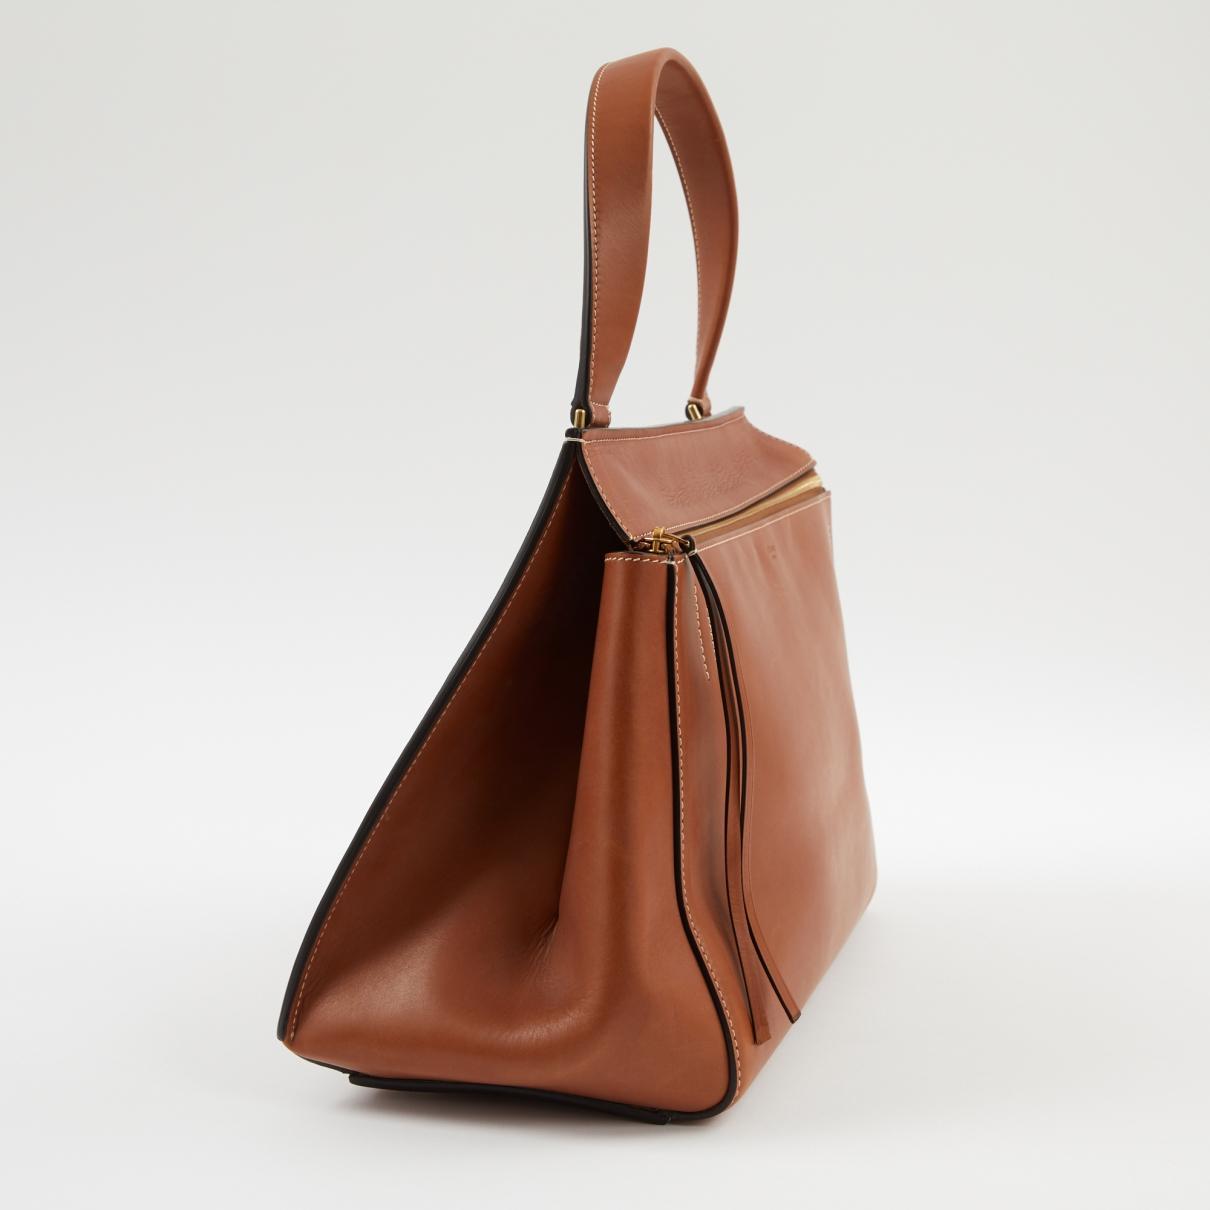 8293b7fca9a0 Céline - Pre-owned Edge Brown Leather Handbags - Lyst. View fullscreen